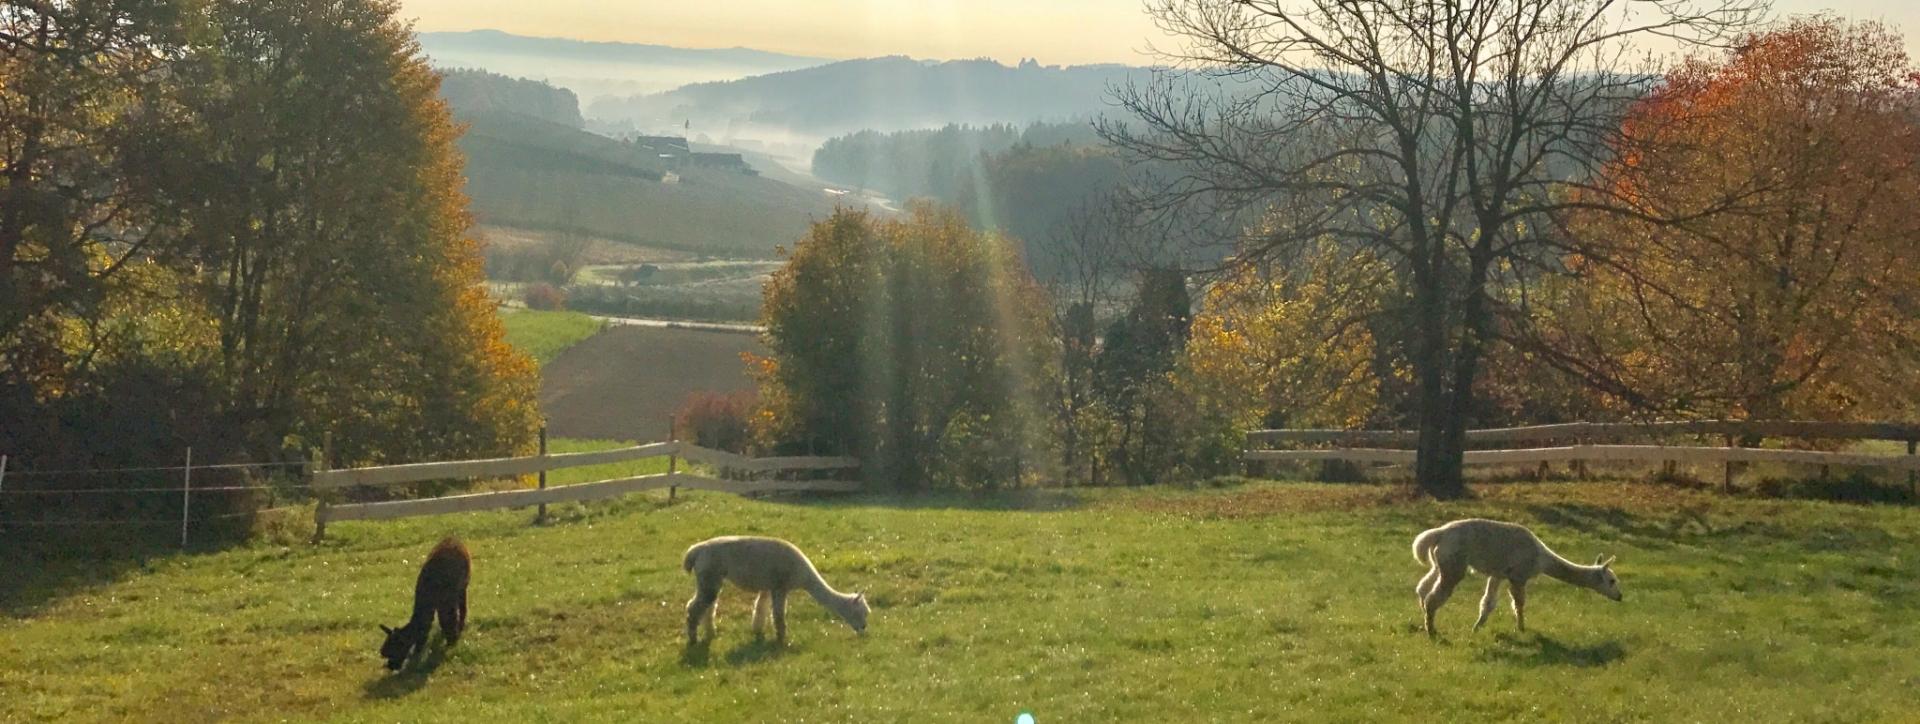 Hohenkogl-Alpakas